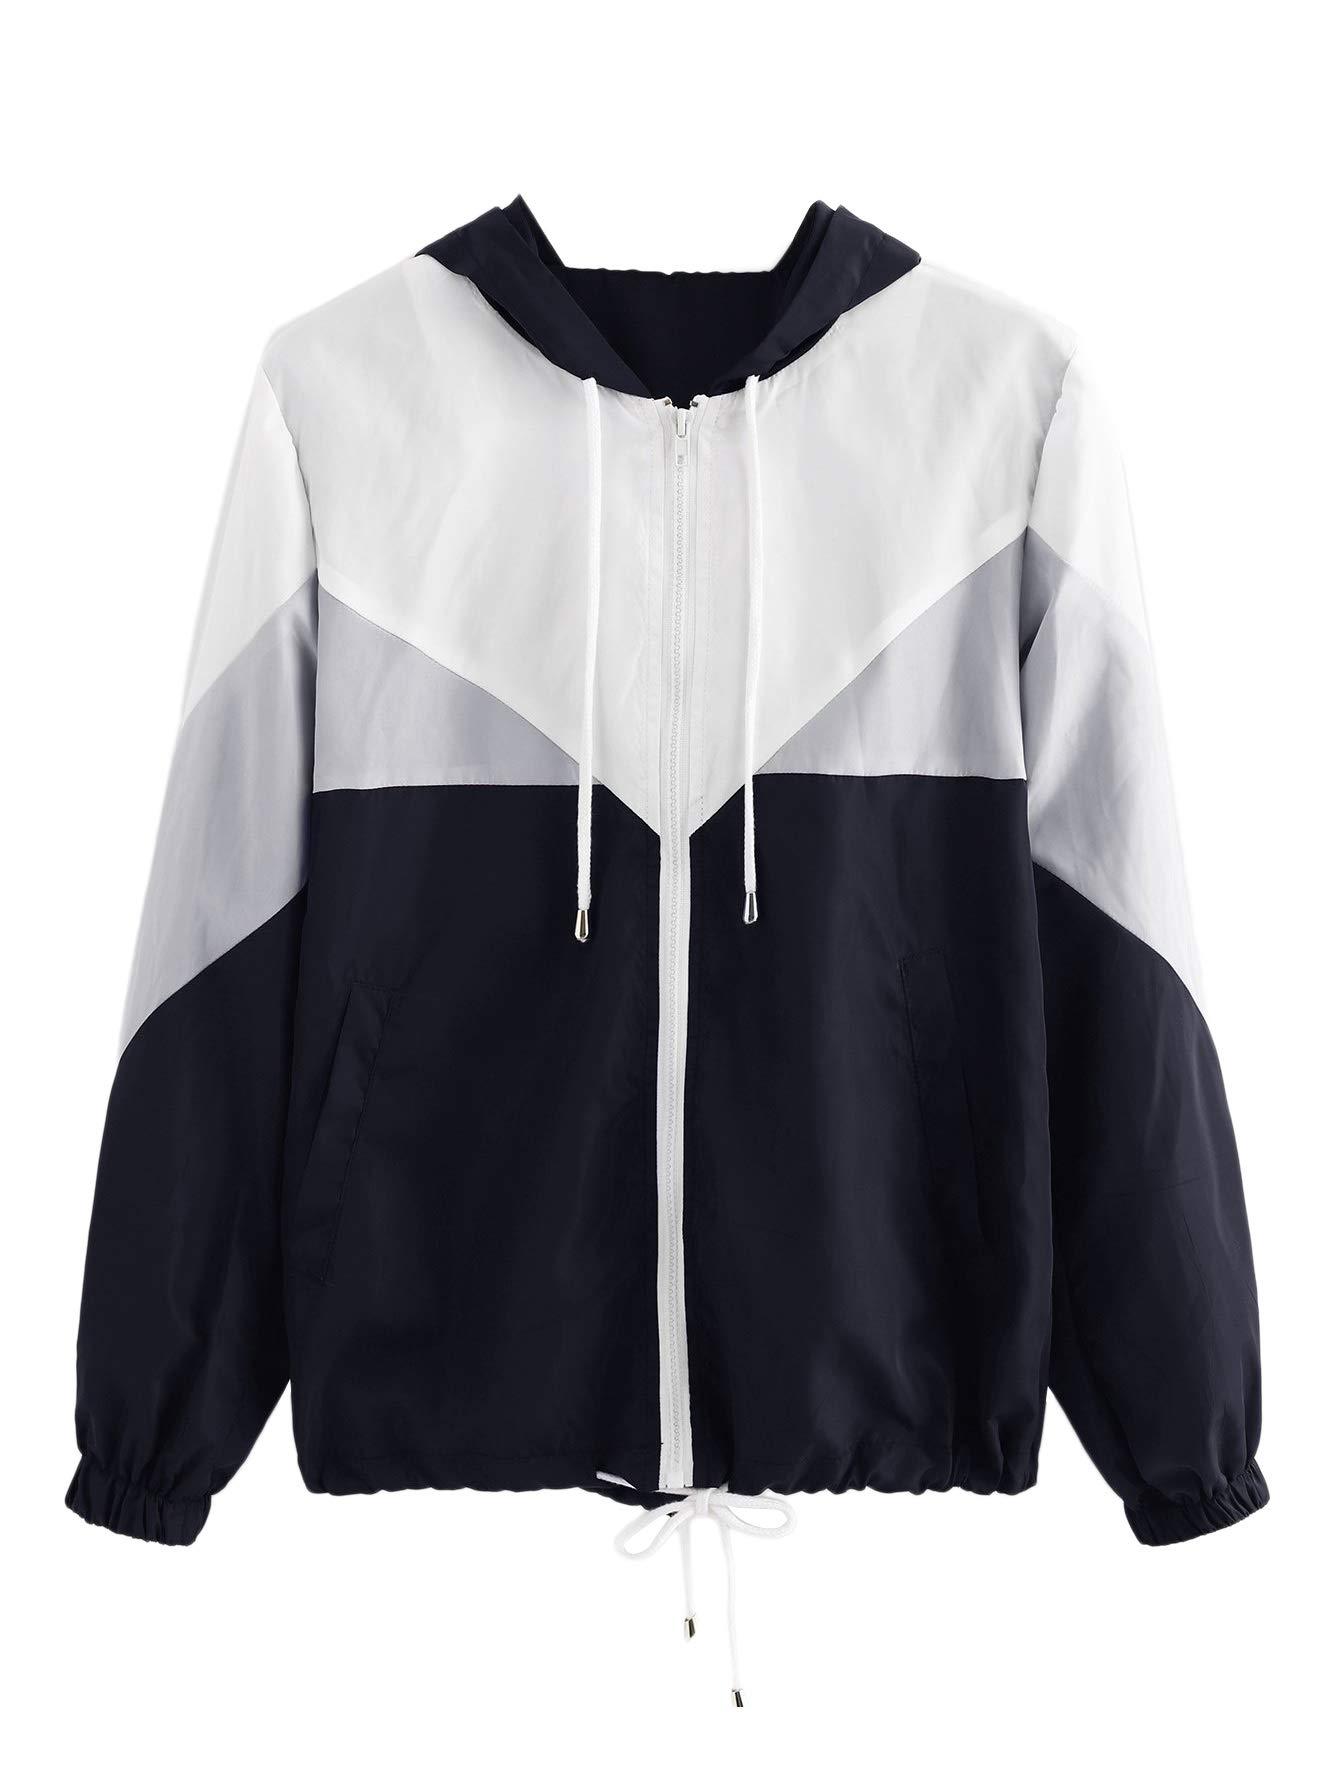 eef01089dd1 Galleon - Milumia Women s Color Block Drawstring Hooded Zip Up Sports Jacket  Windproof Windbreaker Large Multicolor-8